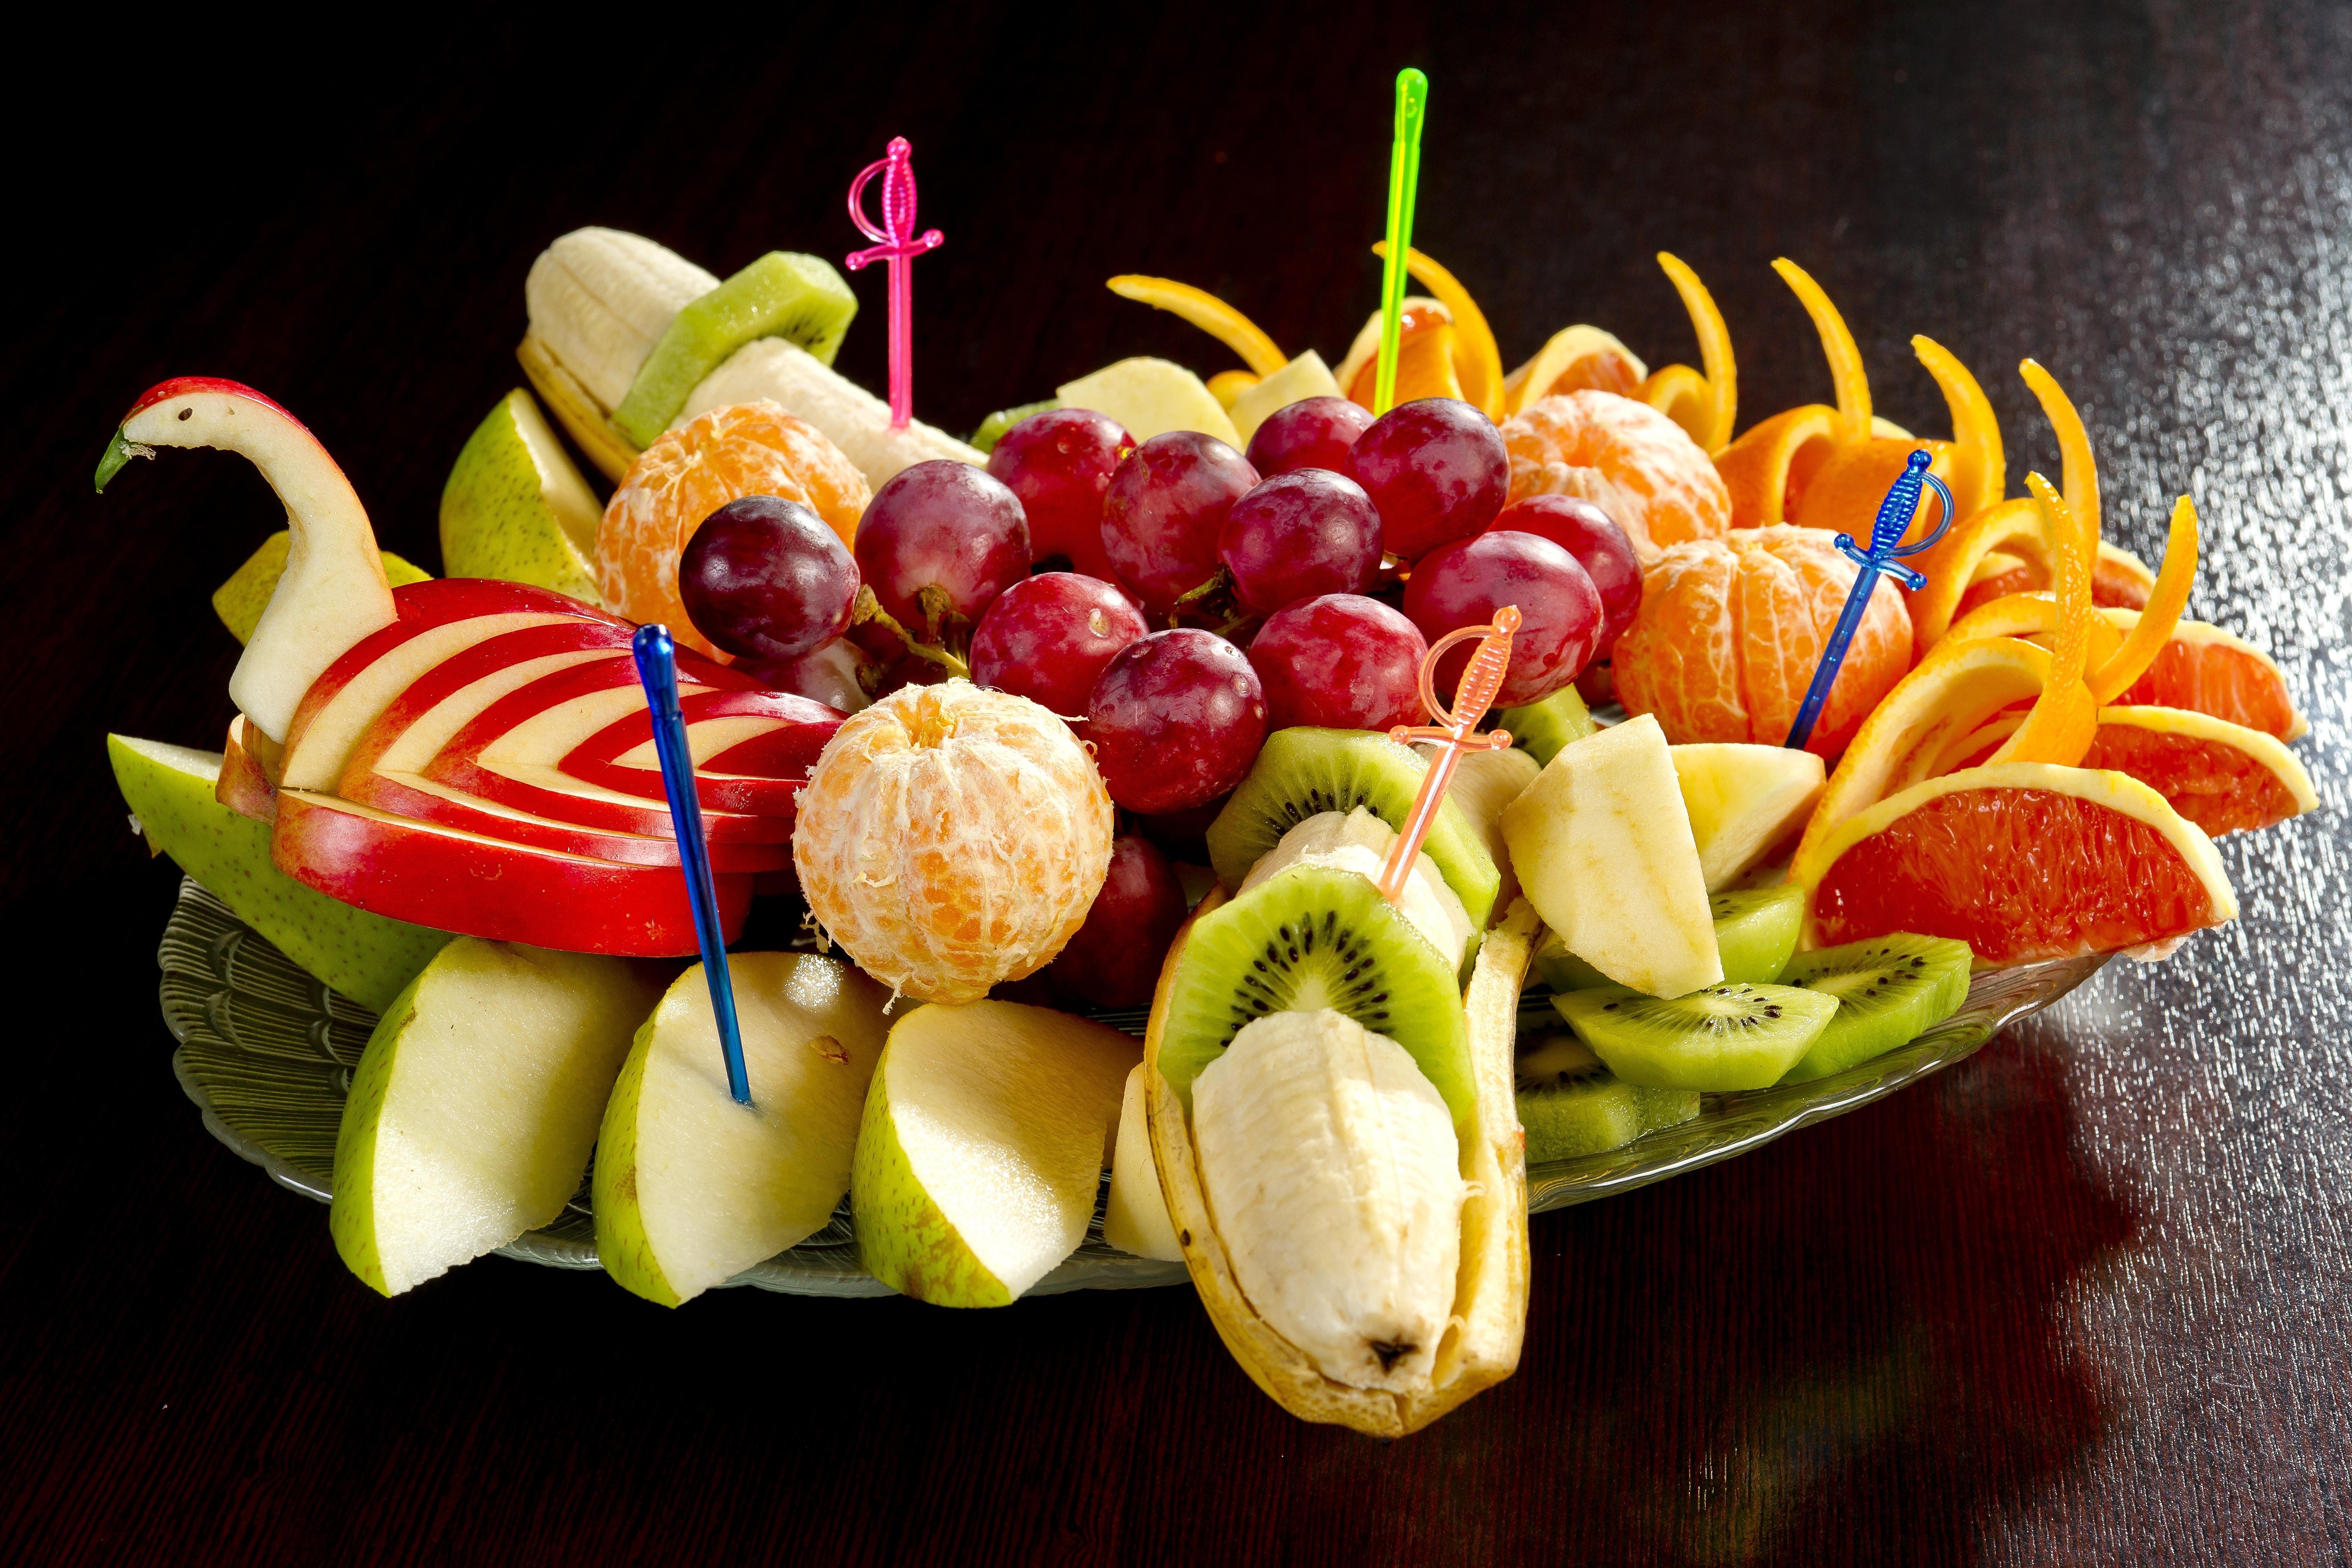 Fotos gratis : Fruta, flor, maduro, plato, Produce, vegetal ...